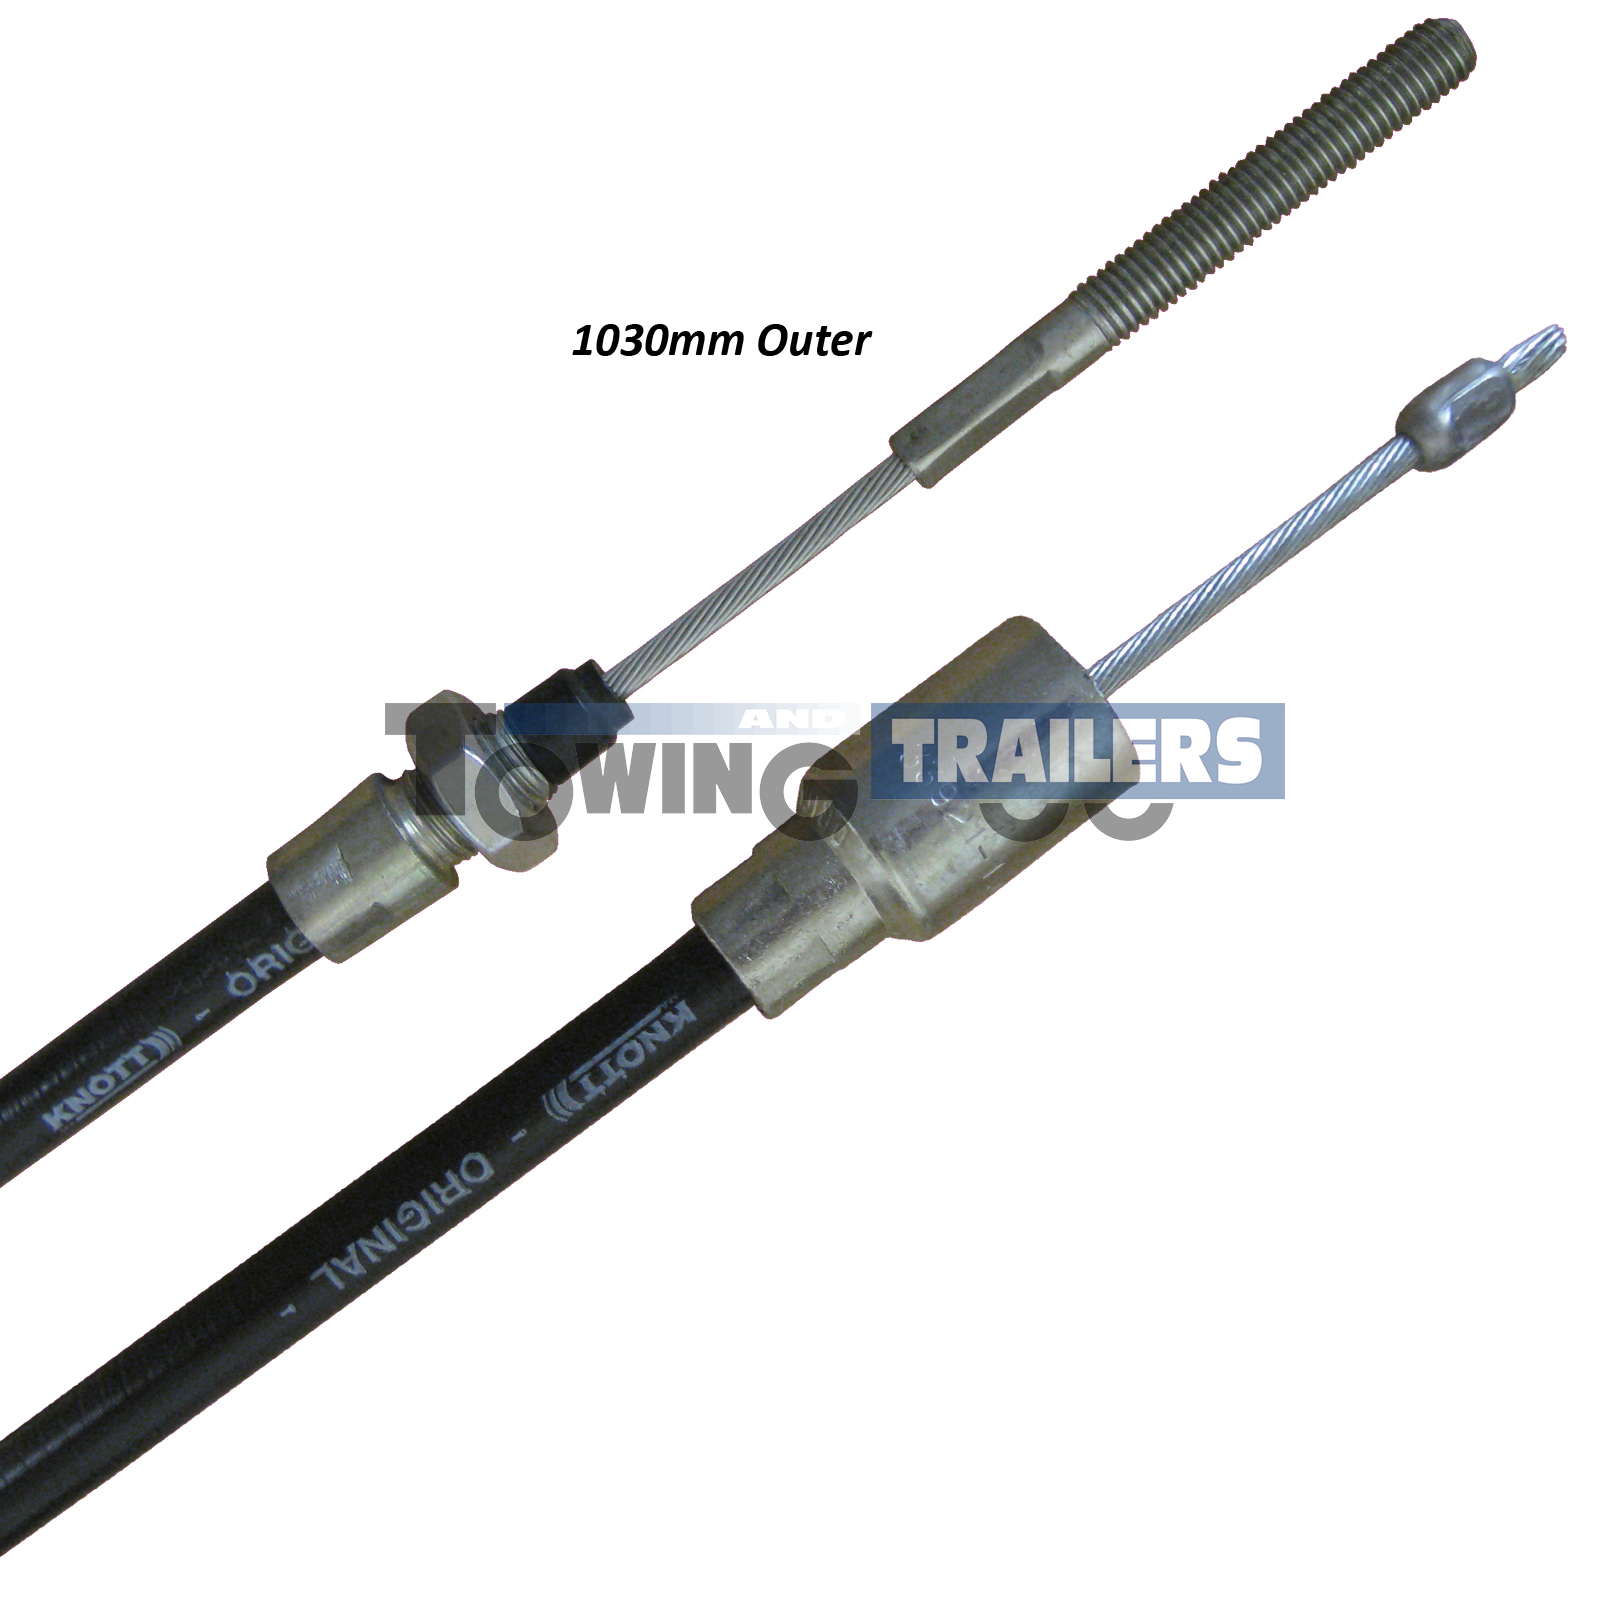 Knott Detachable Bowden Trailer Brake Cable 1030mm Outer 33921 1 11